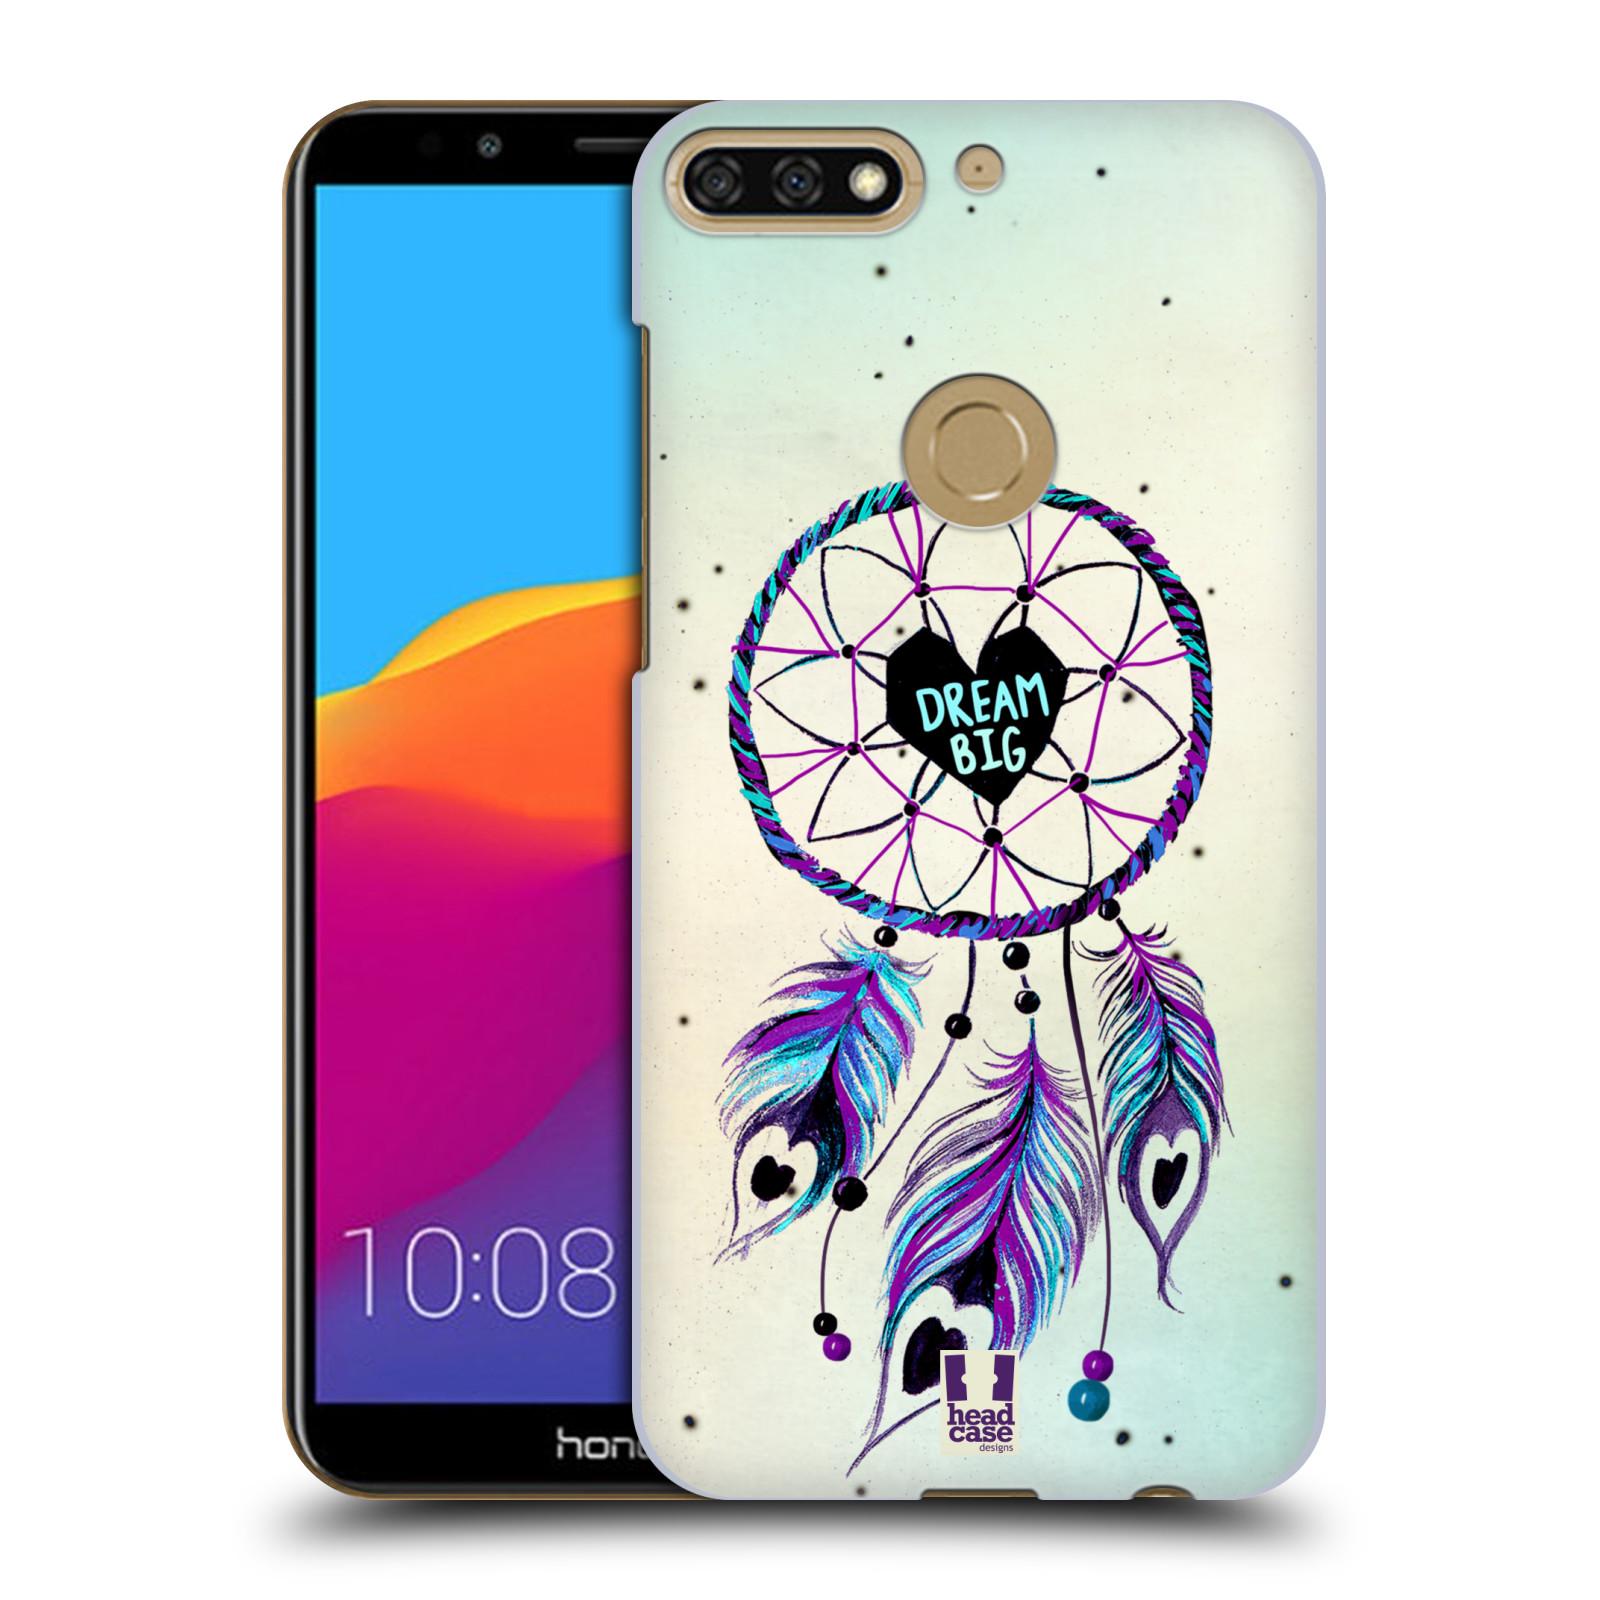 Plastové pouzdro na mobil Huawei Y7 Prime 2018 - Head Case - Lapač Assorted Dream Big Srdce